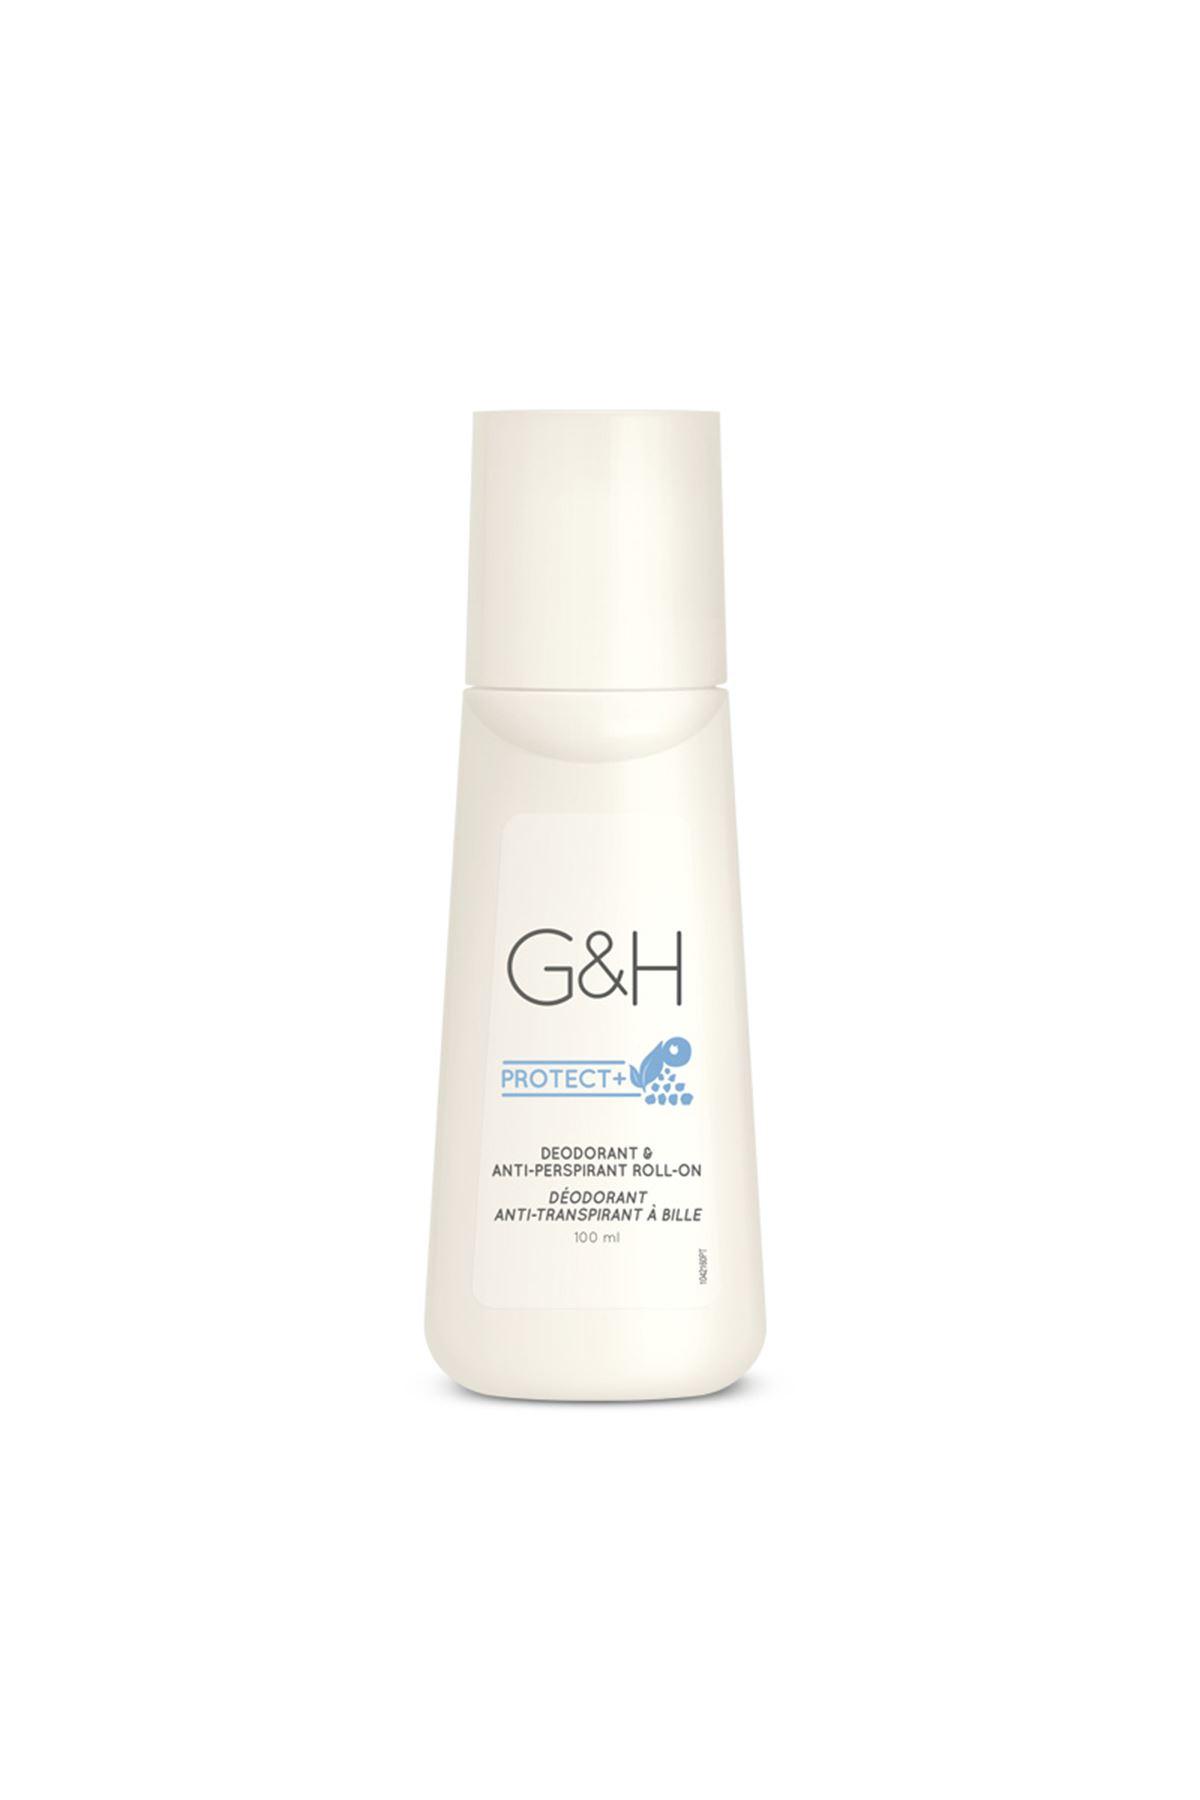 Terlemeye Karşı/Koku Giderici Roll-On Deodorant - G&H PROTECT+™